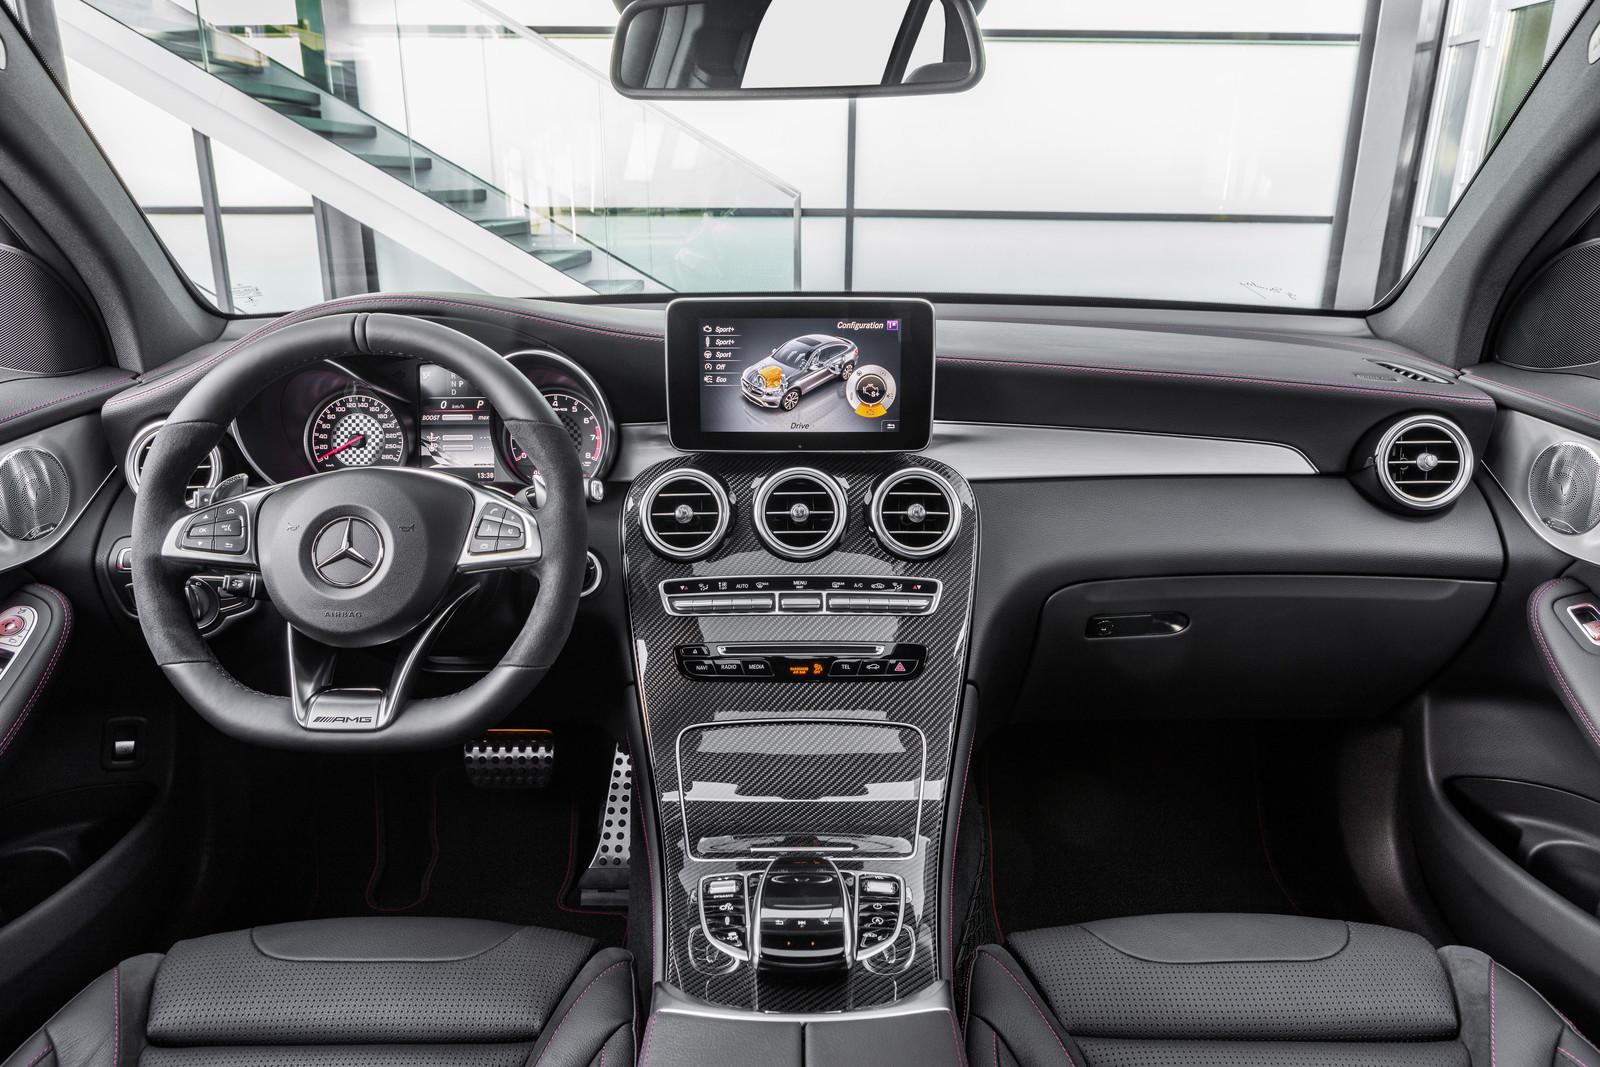 Foto de Mercedes-AMG GLC 43 4MATIC Coupé (22/24)